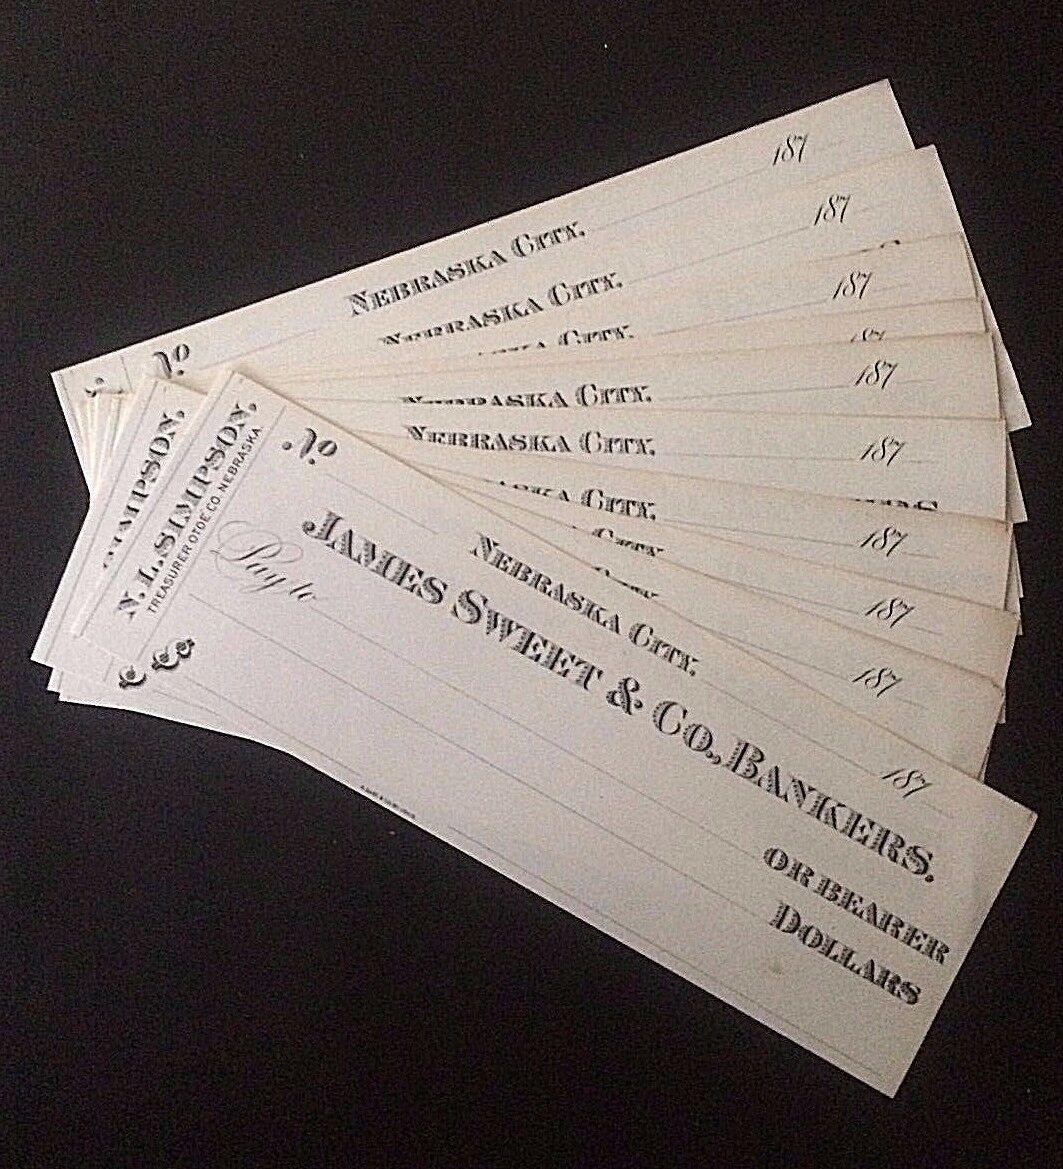 10 NEBRASKA CITY JAMES SWEET CHECKS of the 1870's PRINTED by AUG. GAST ST. LOUIS